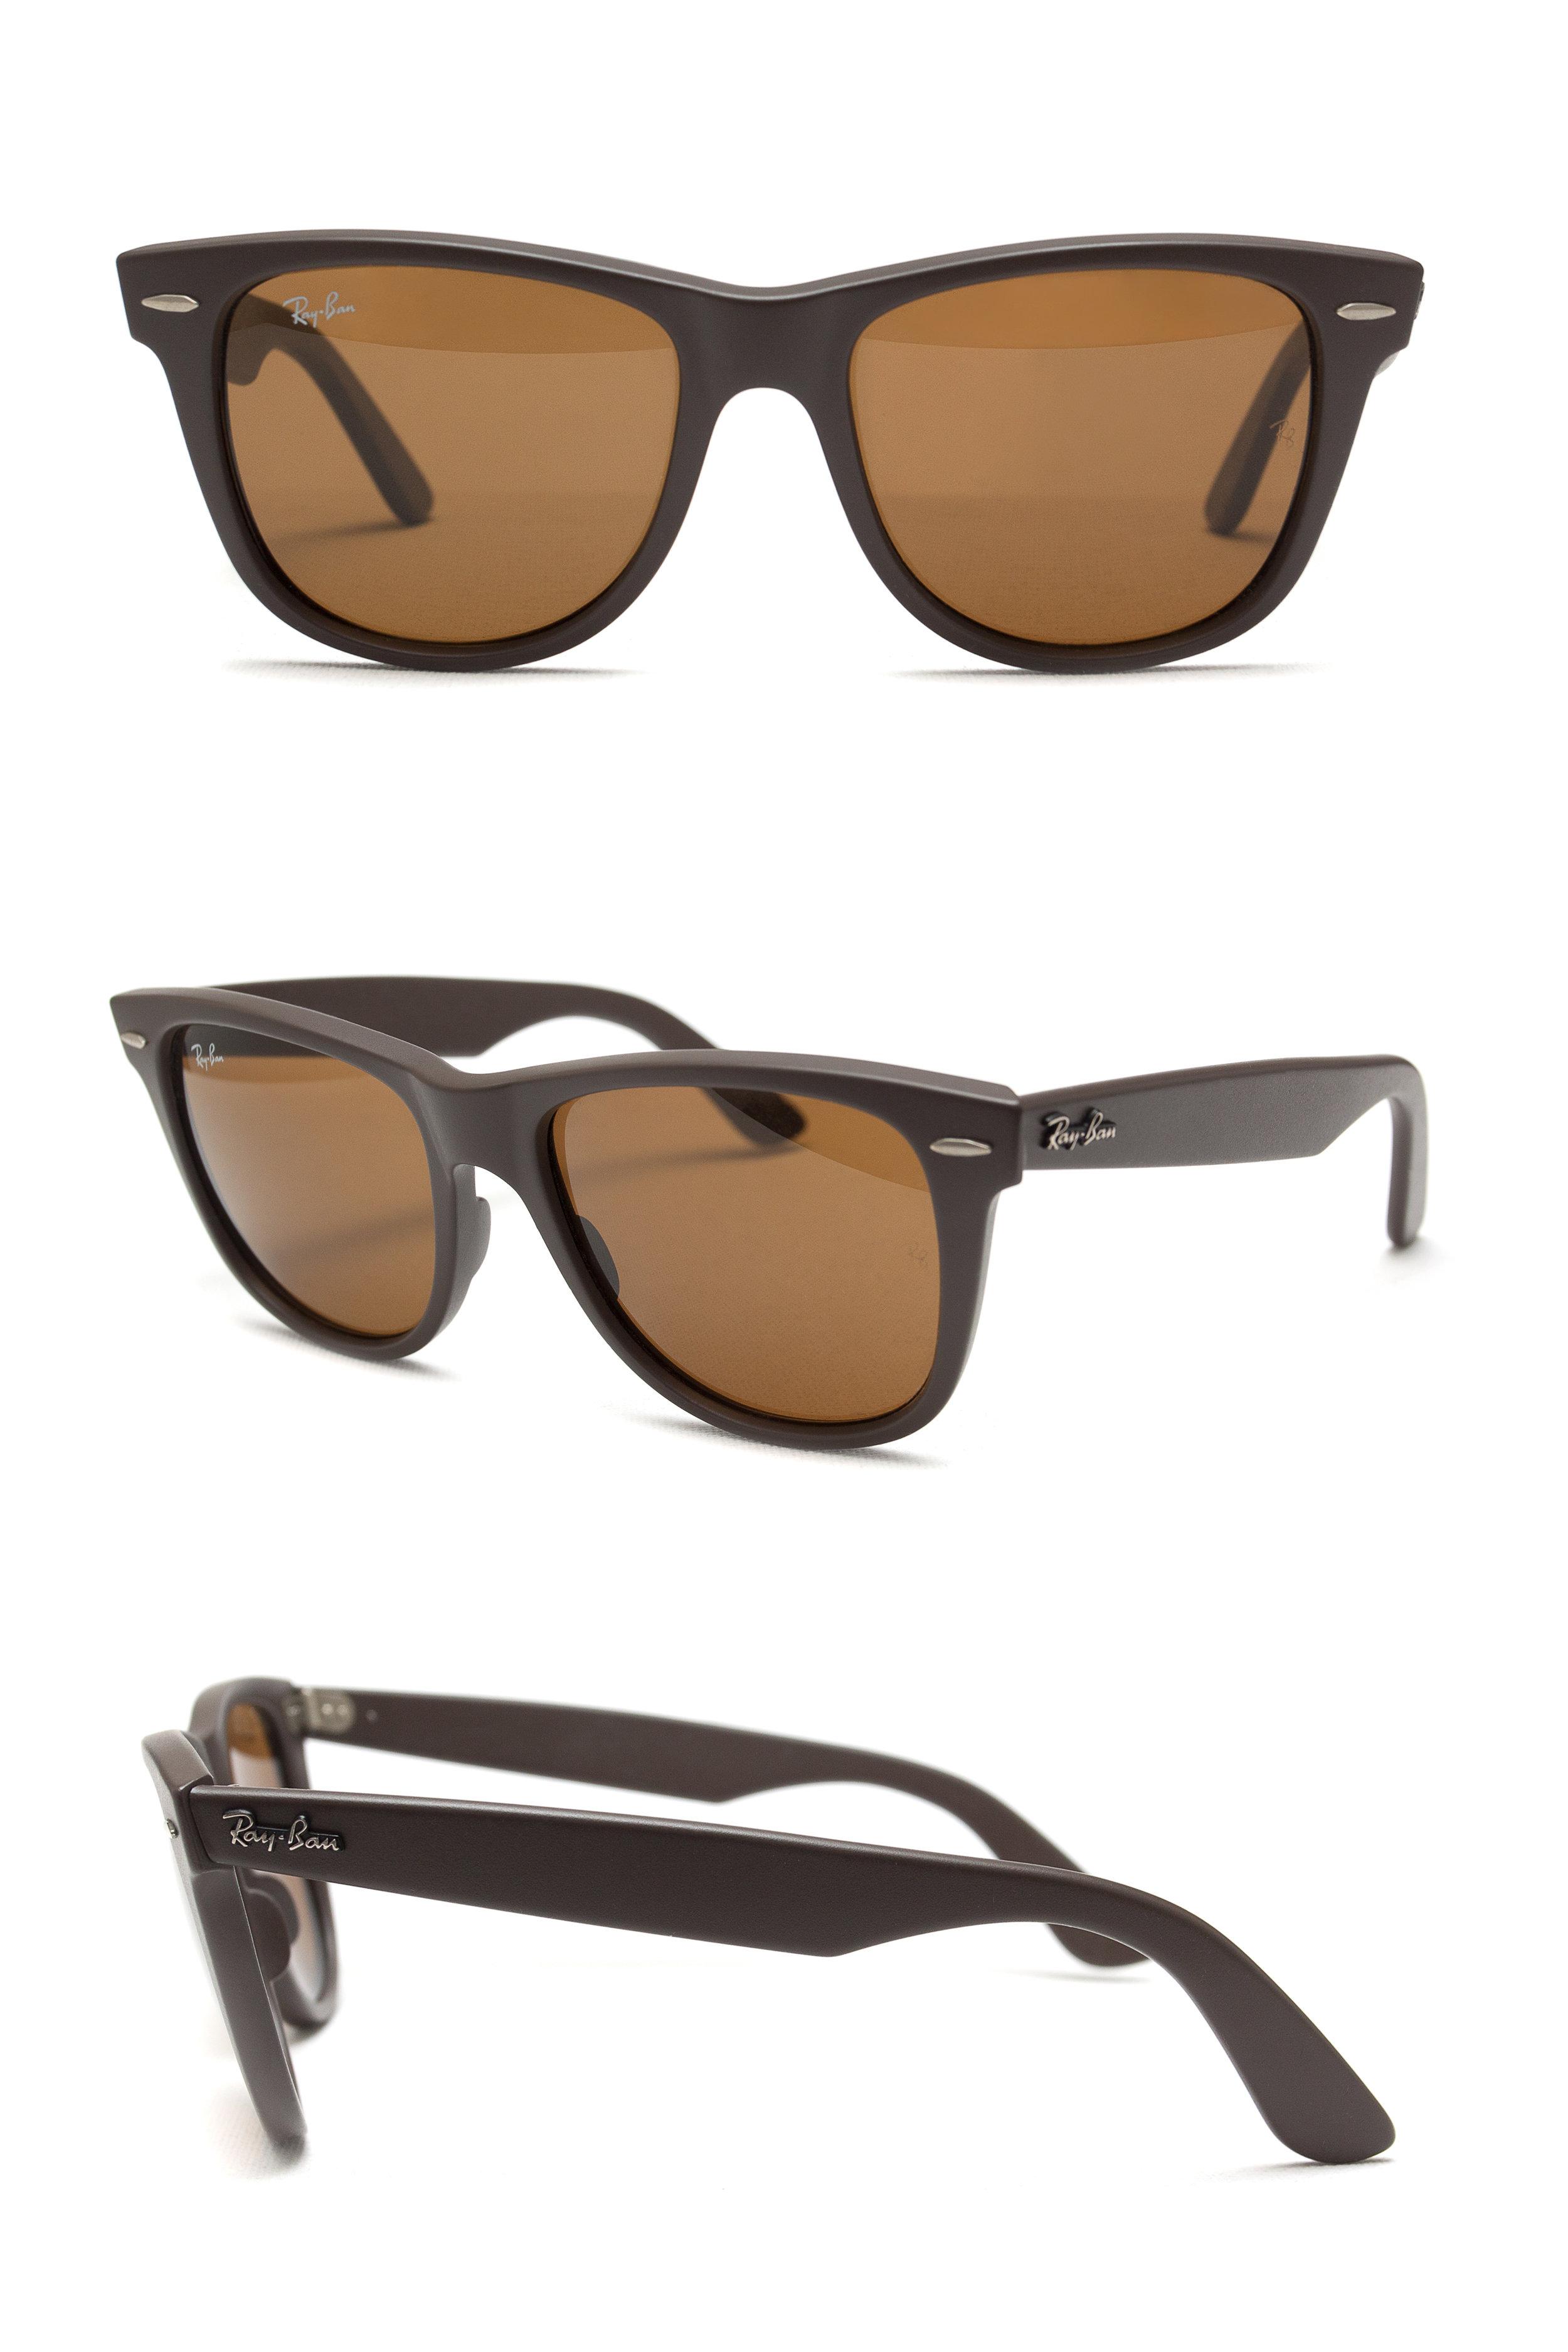 Sunglasses_Composite.jpg